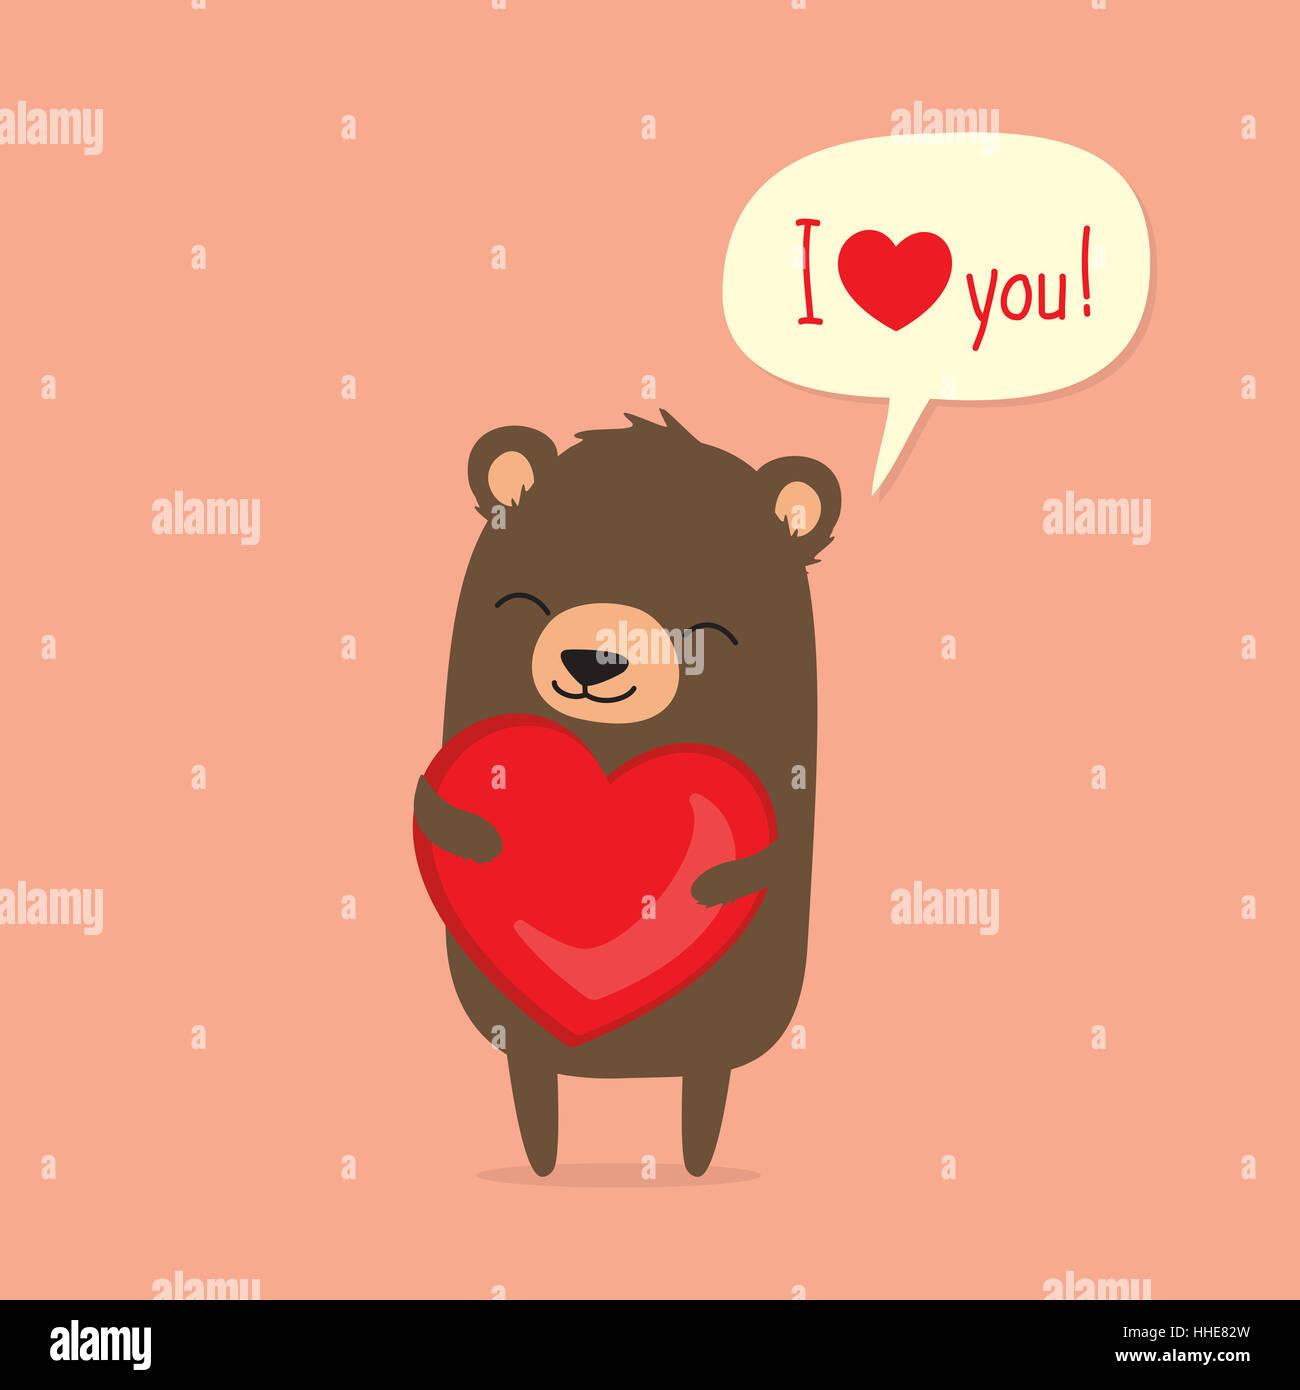 Cute Cartoon Saying I Love You